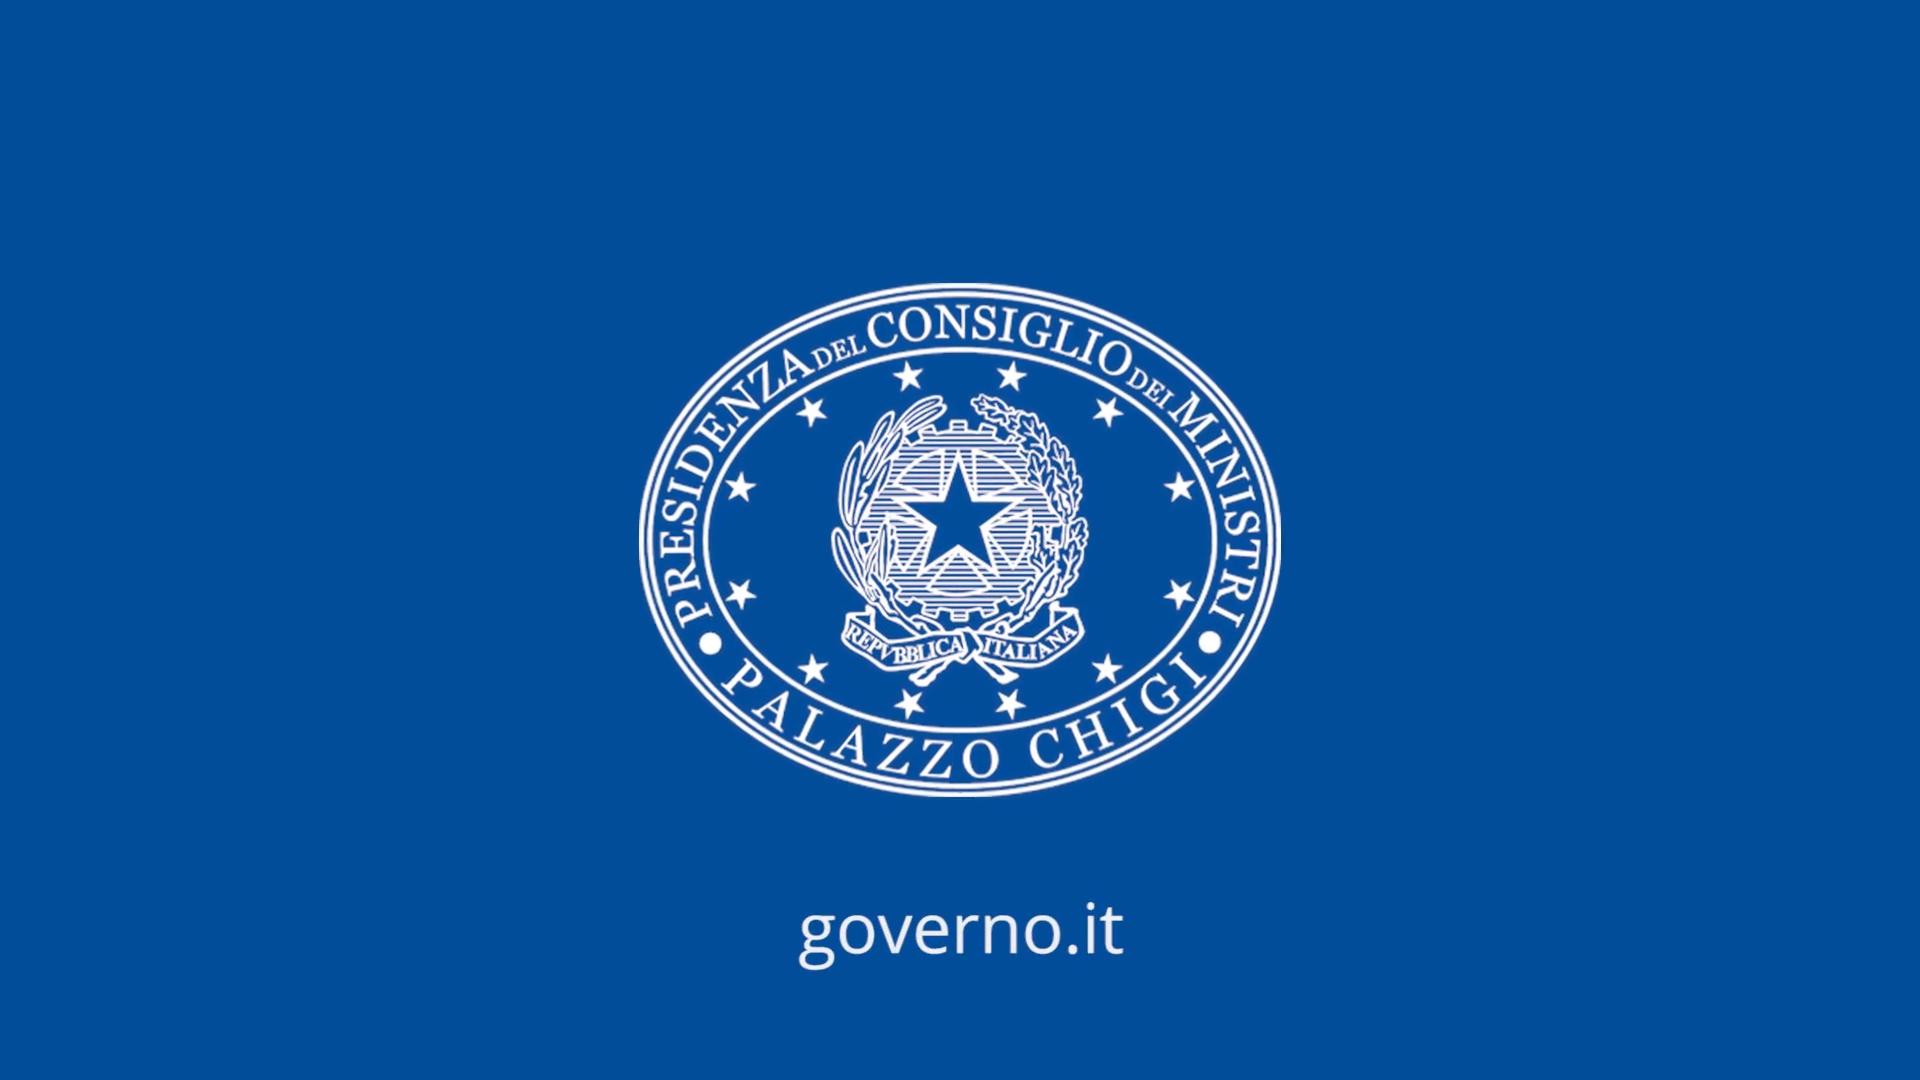 logo_governoit